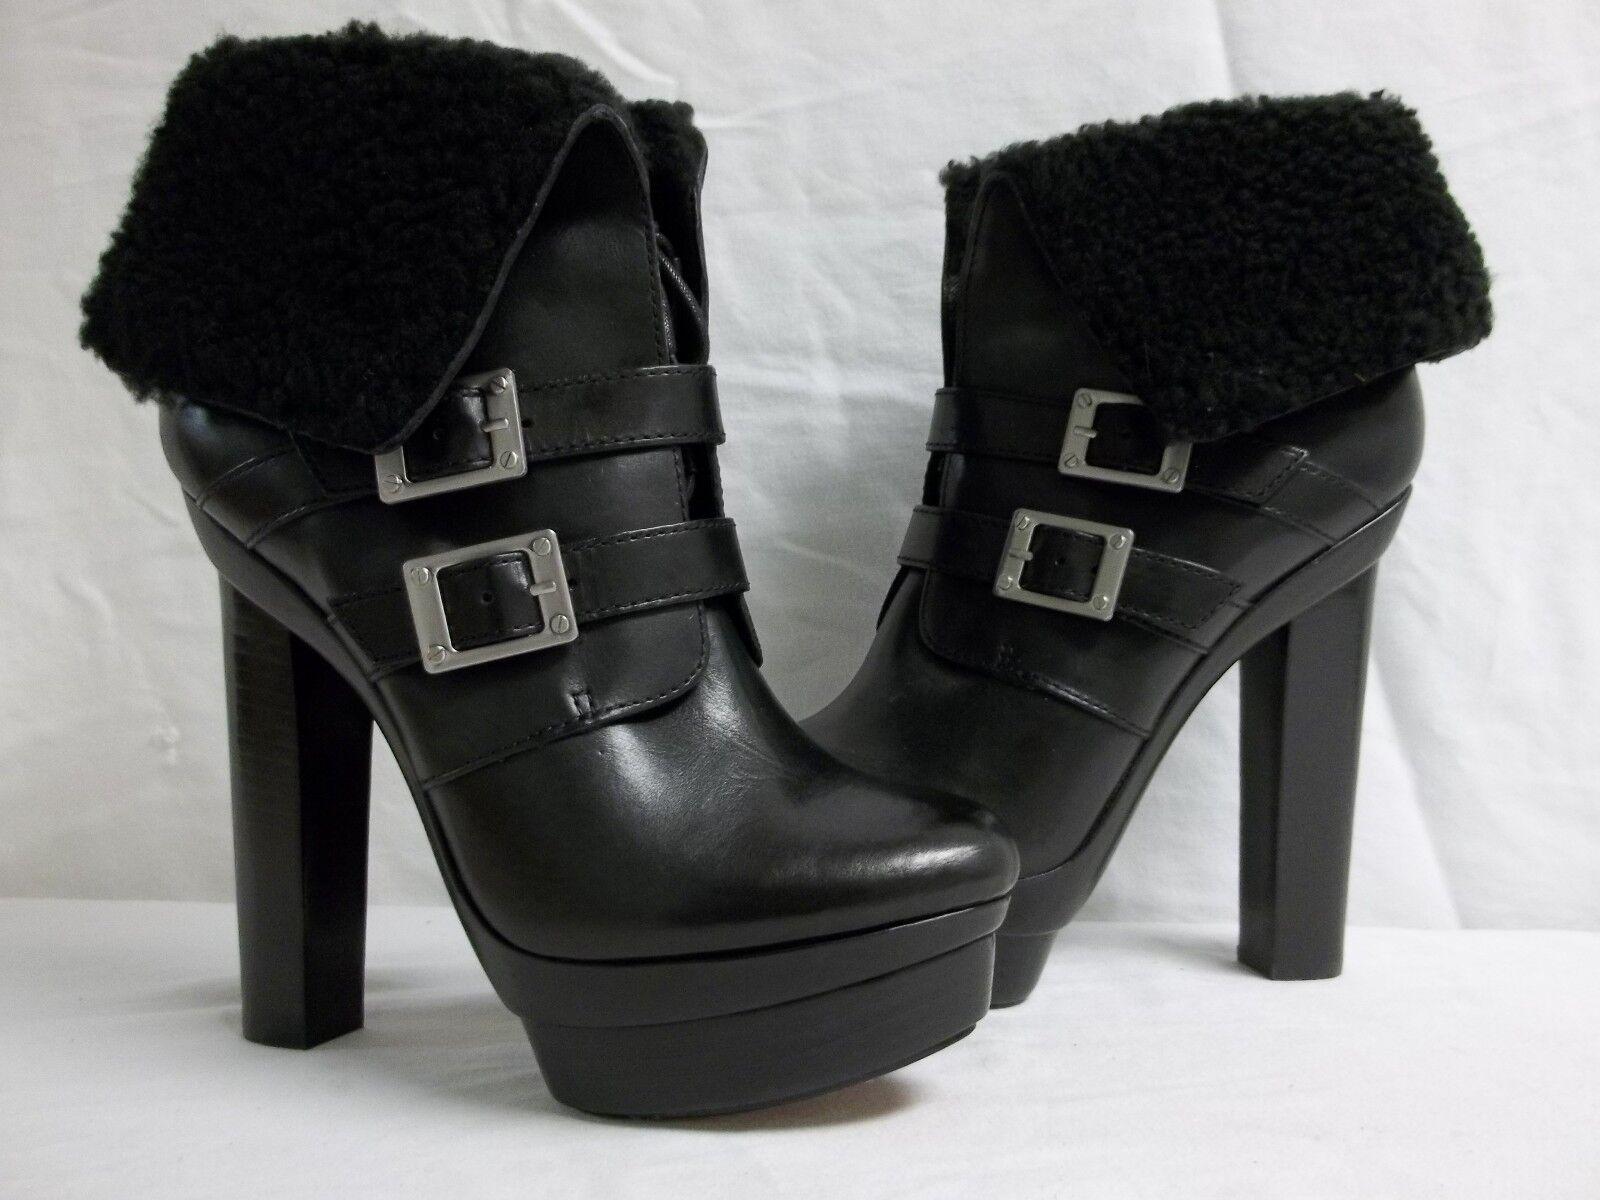 Rachel Zoe Size 10 M Piper Leather Black Booties Heels New Womens shoes NWOB